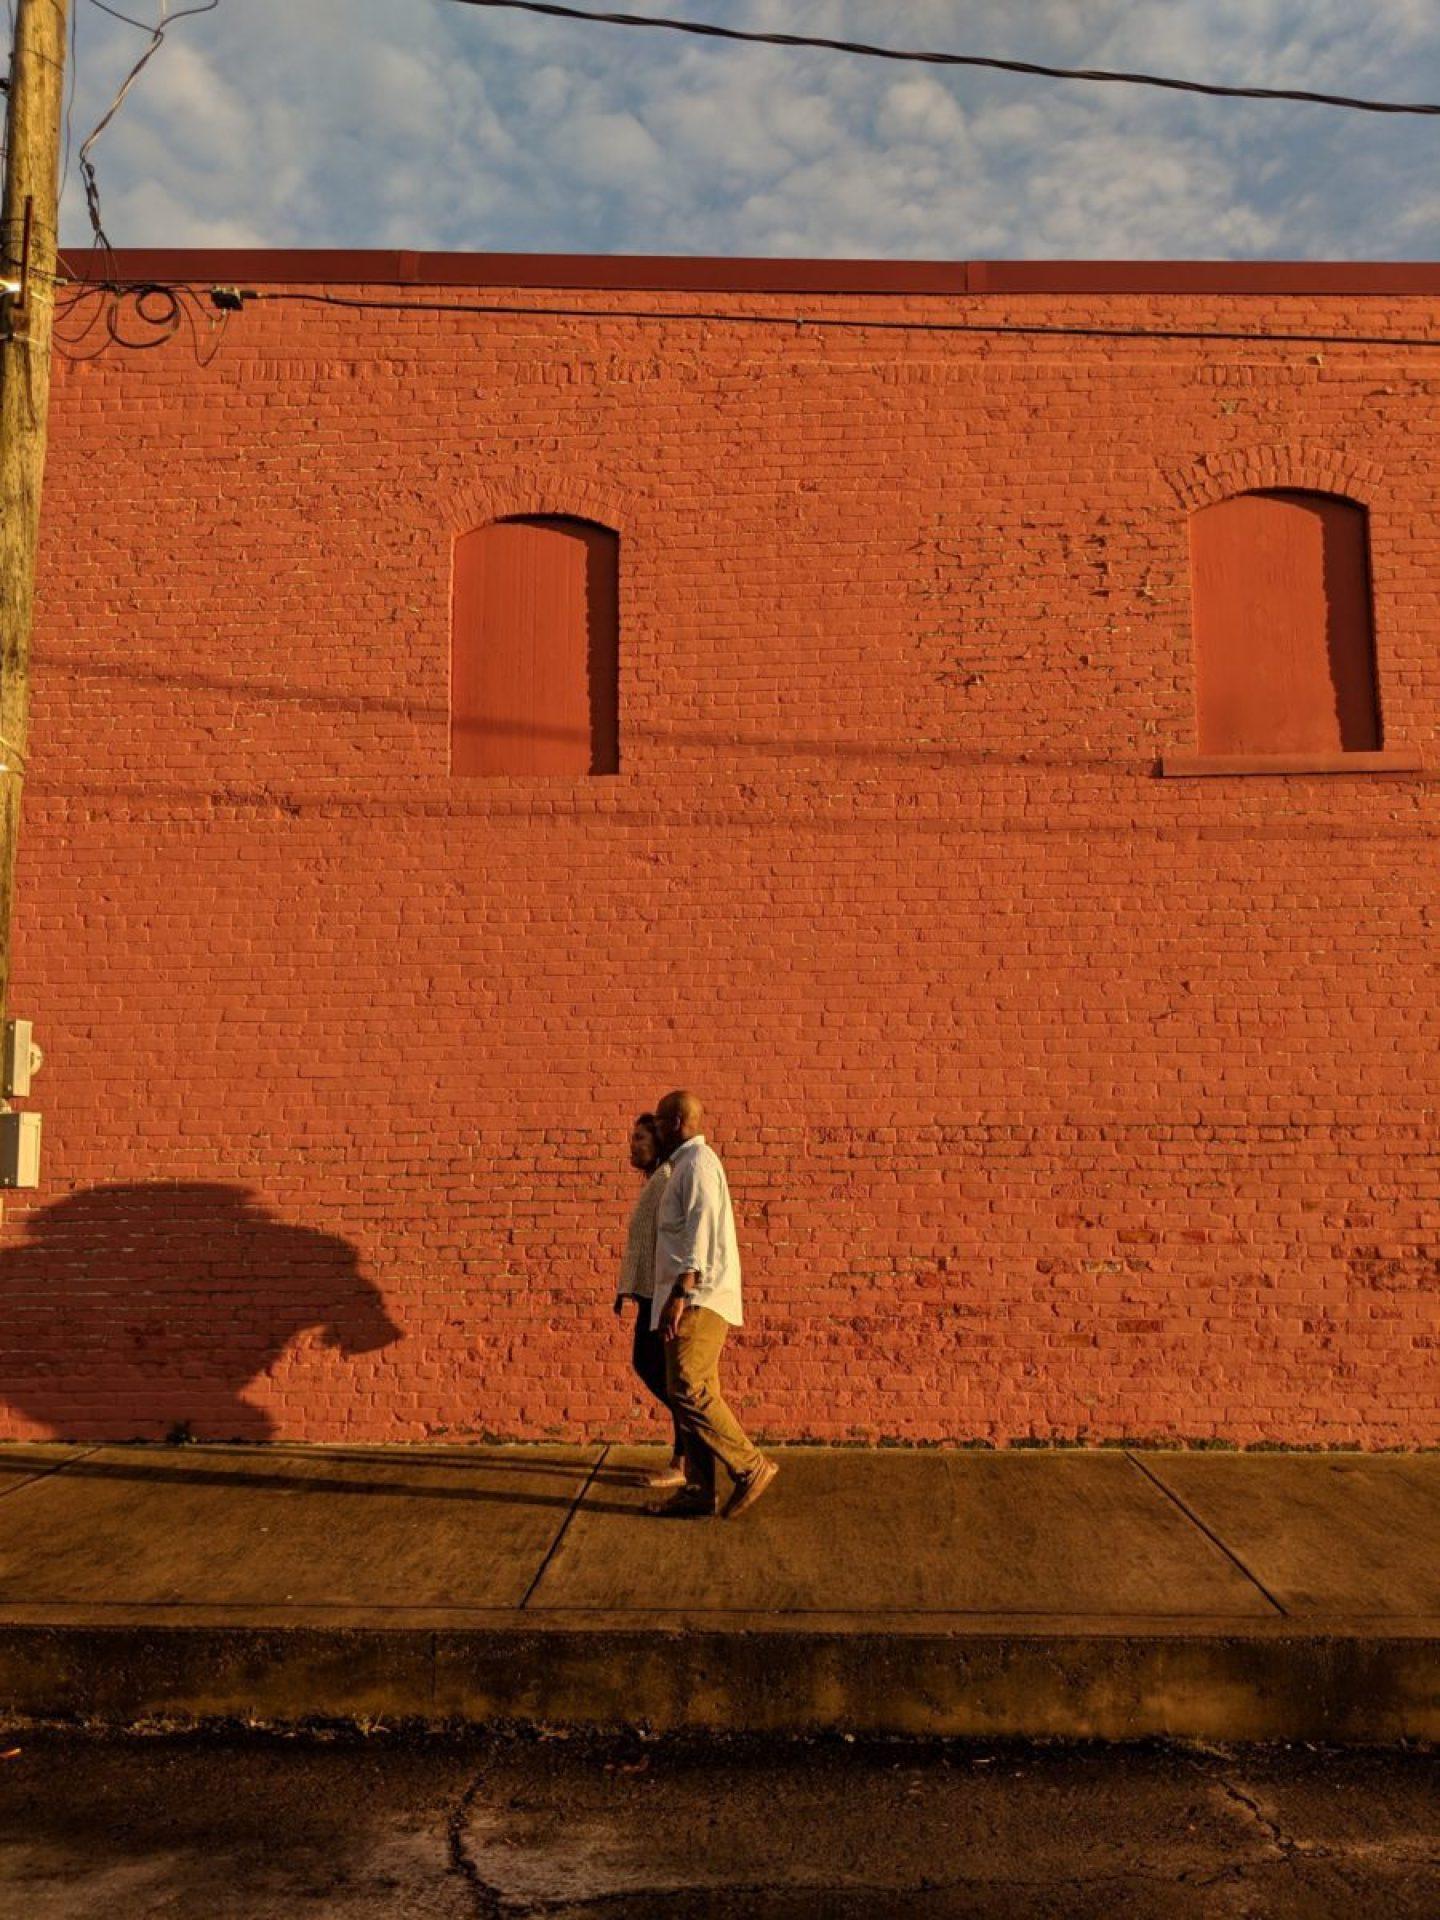 IMG_20190502_191517-1440x1920 Arkansas Delta Family Road Trip:  Black Heritage, Art & More!